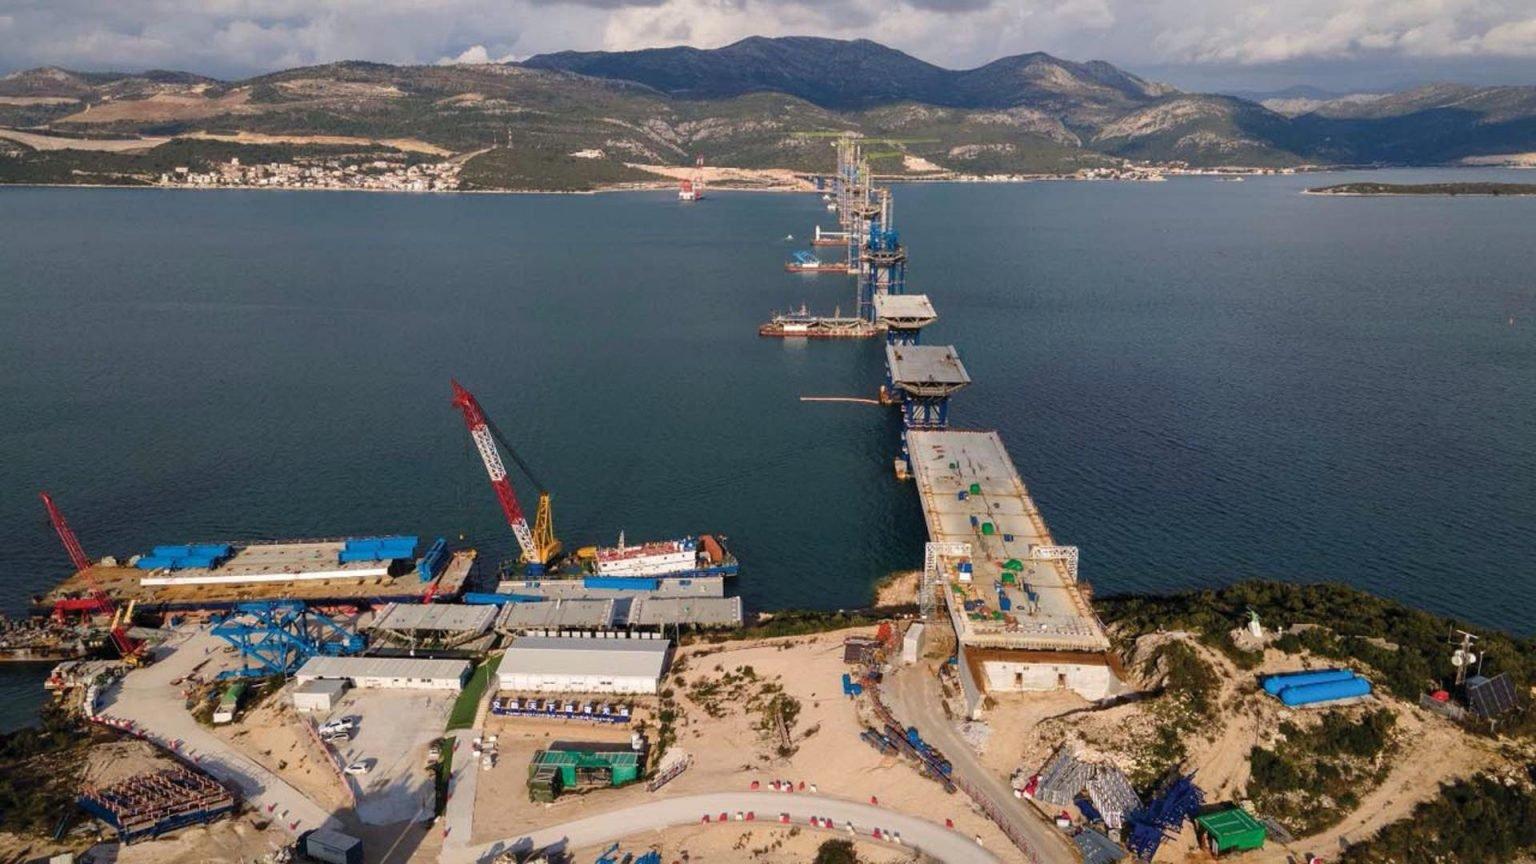 Croatia: Pelješac bridge structure rises above sea levels